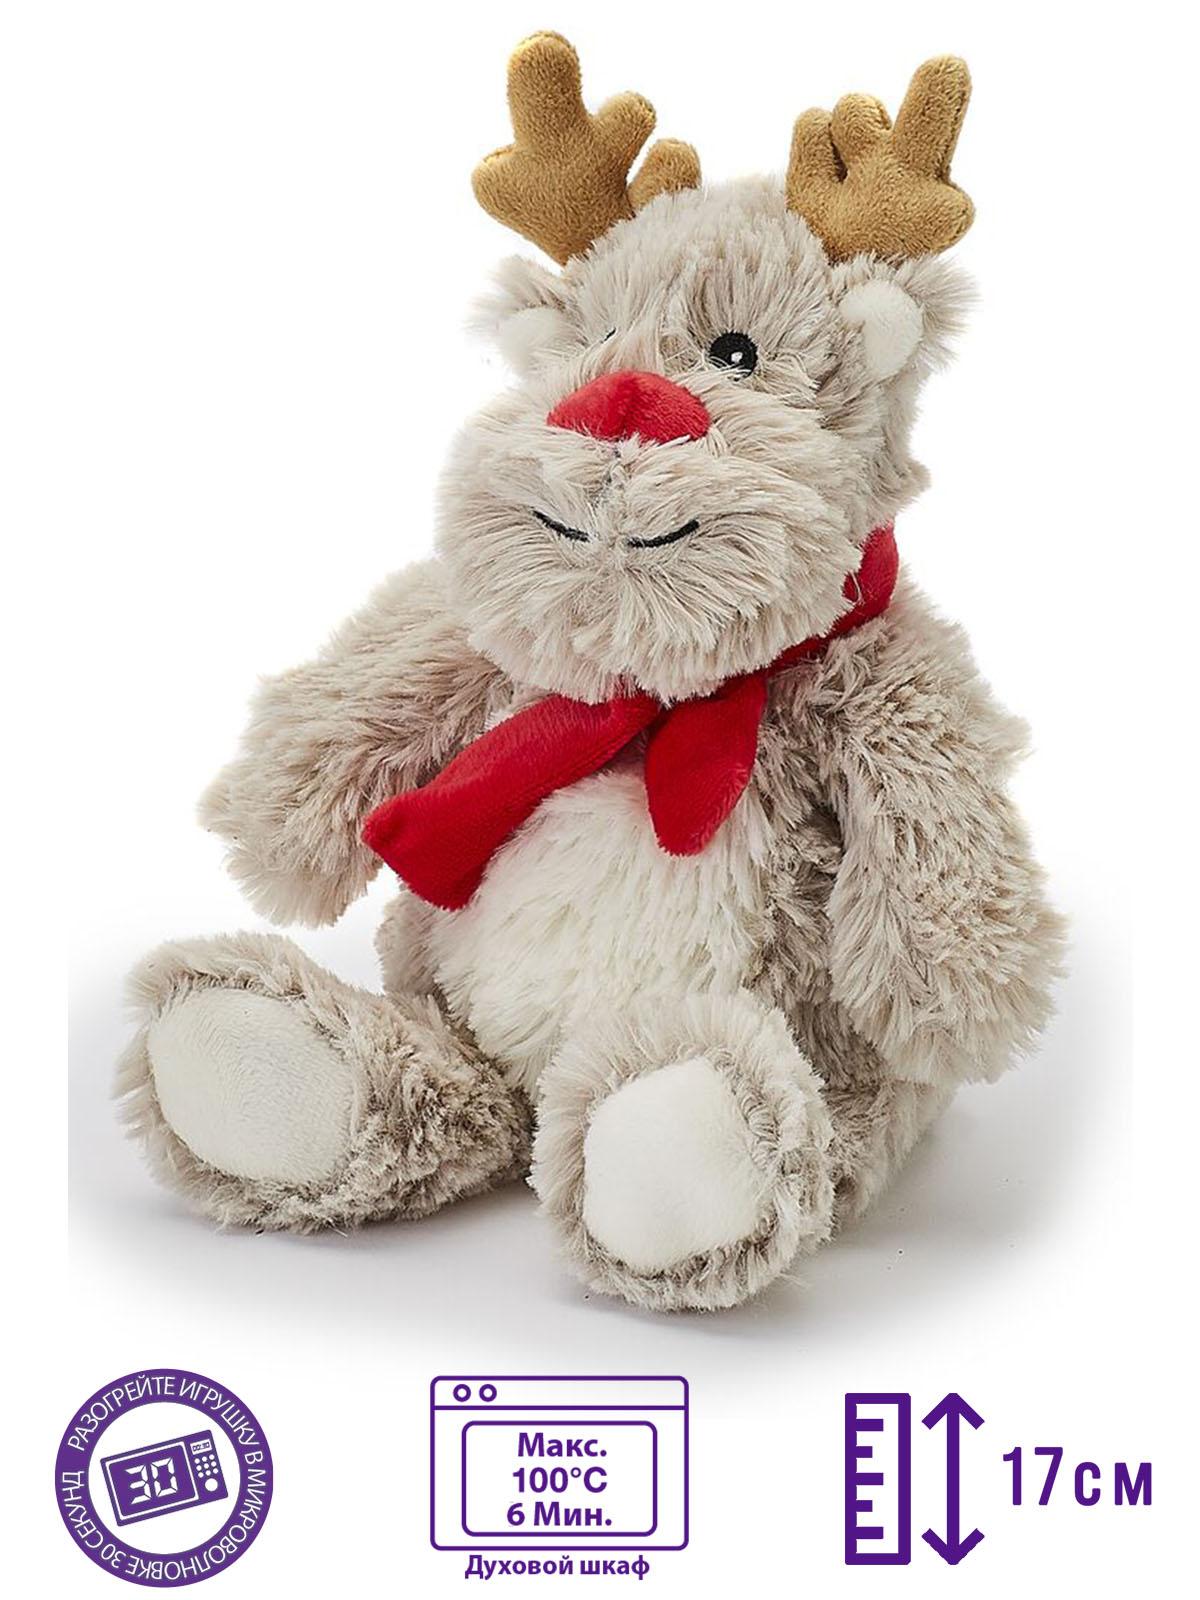 Пинкл (Pinkl) | Игрушка-грелка Junior Олененок | Intelex Warmies Cozy Plush Junior Reindeer